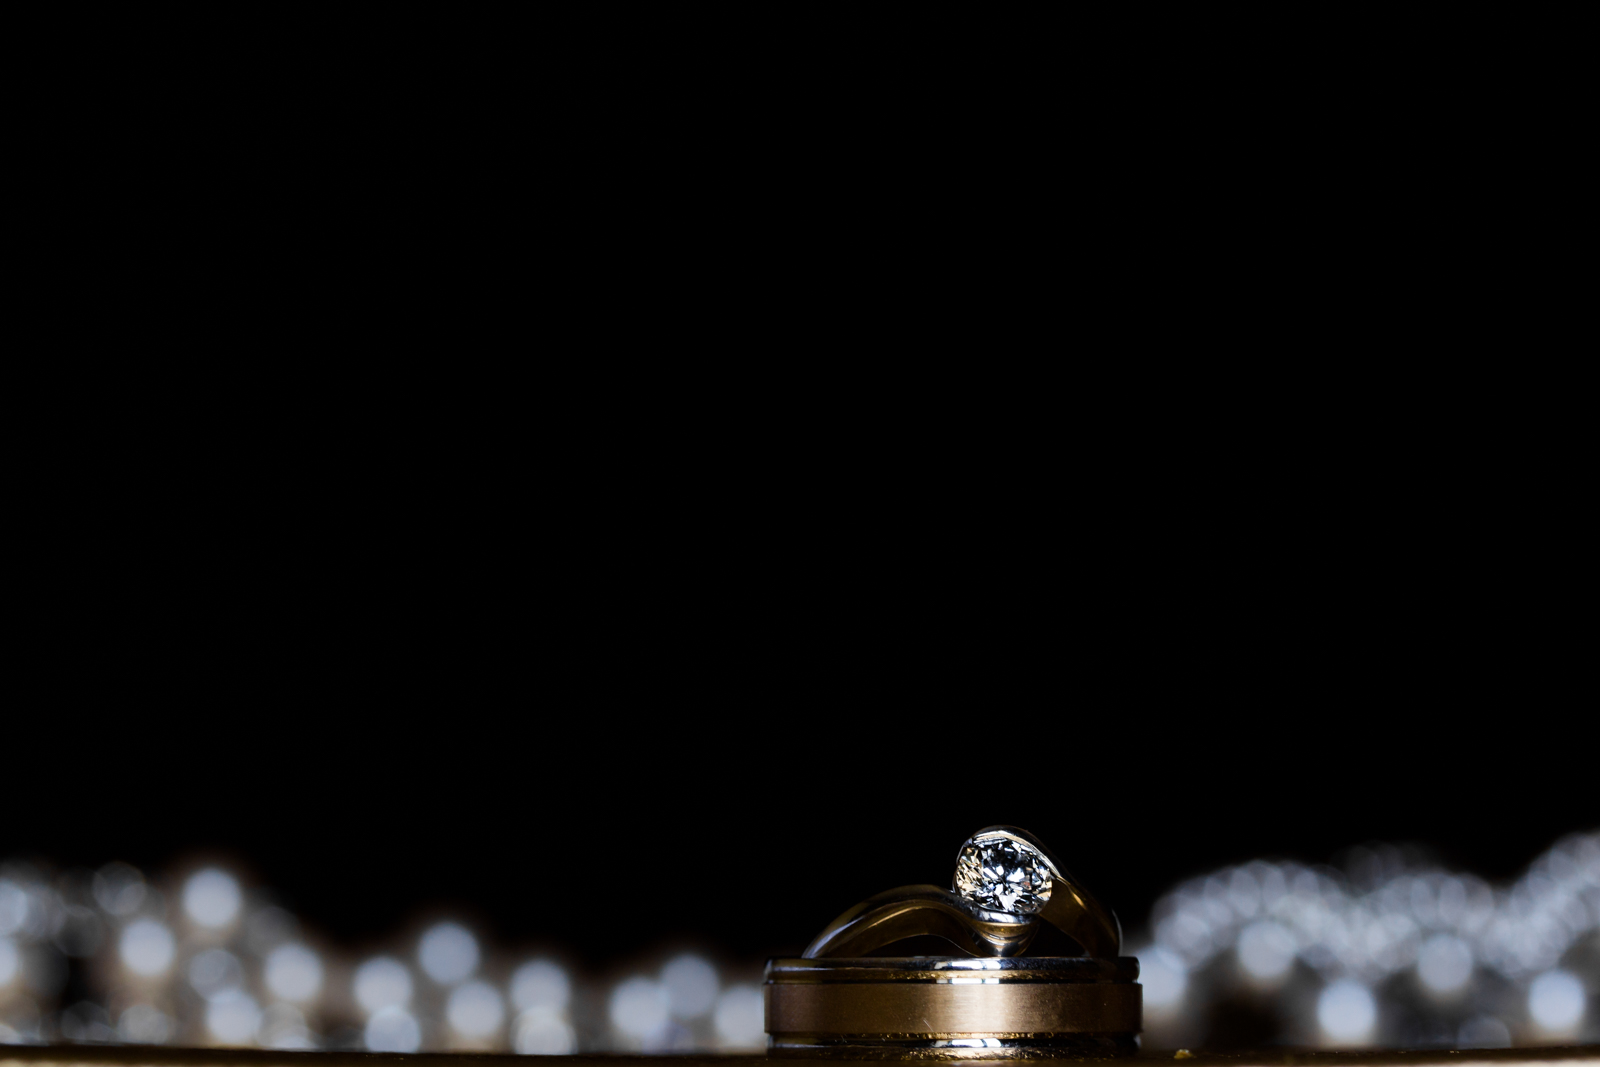 naperville-wedding-photography-5.jpg